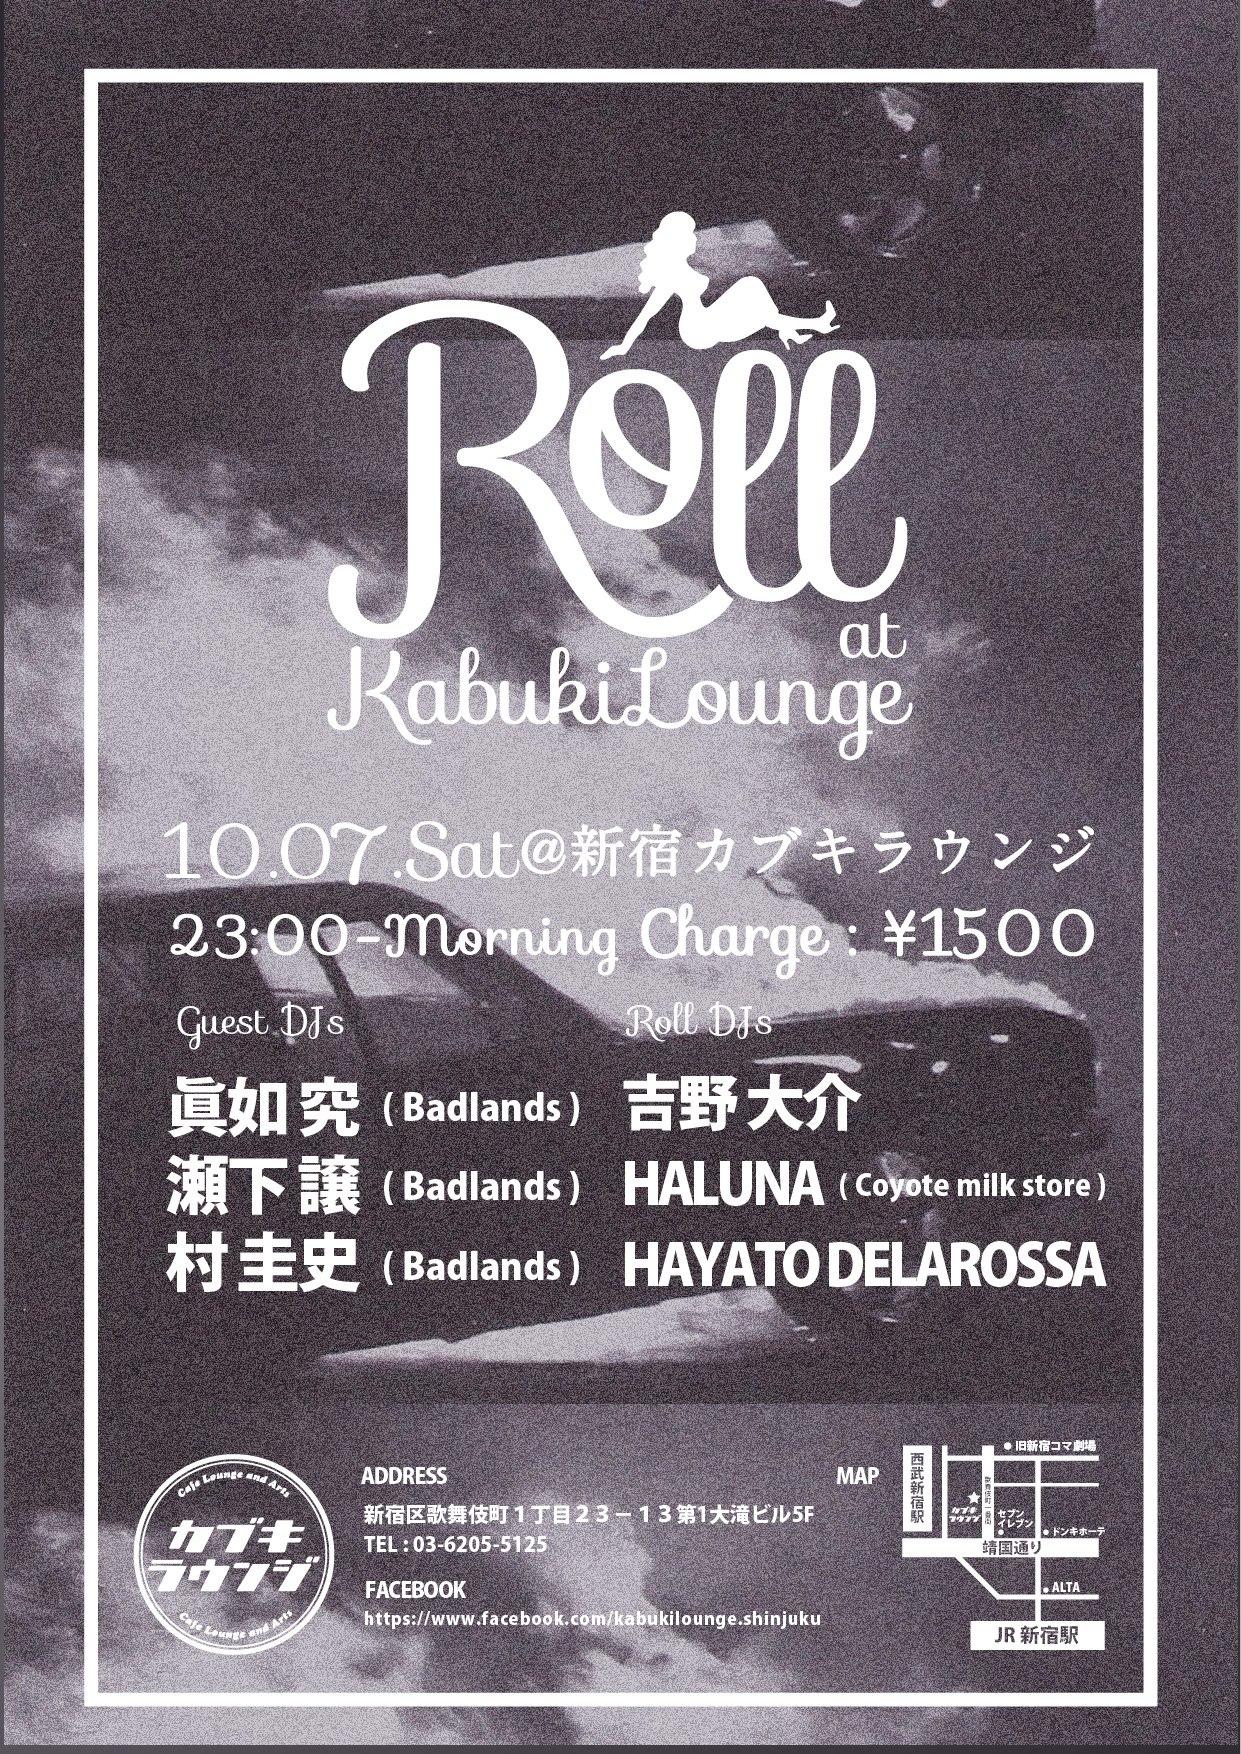 10/7 Roll at 新宿カブキラウンジ